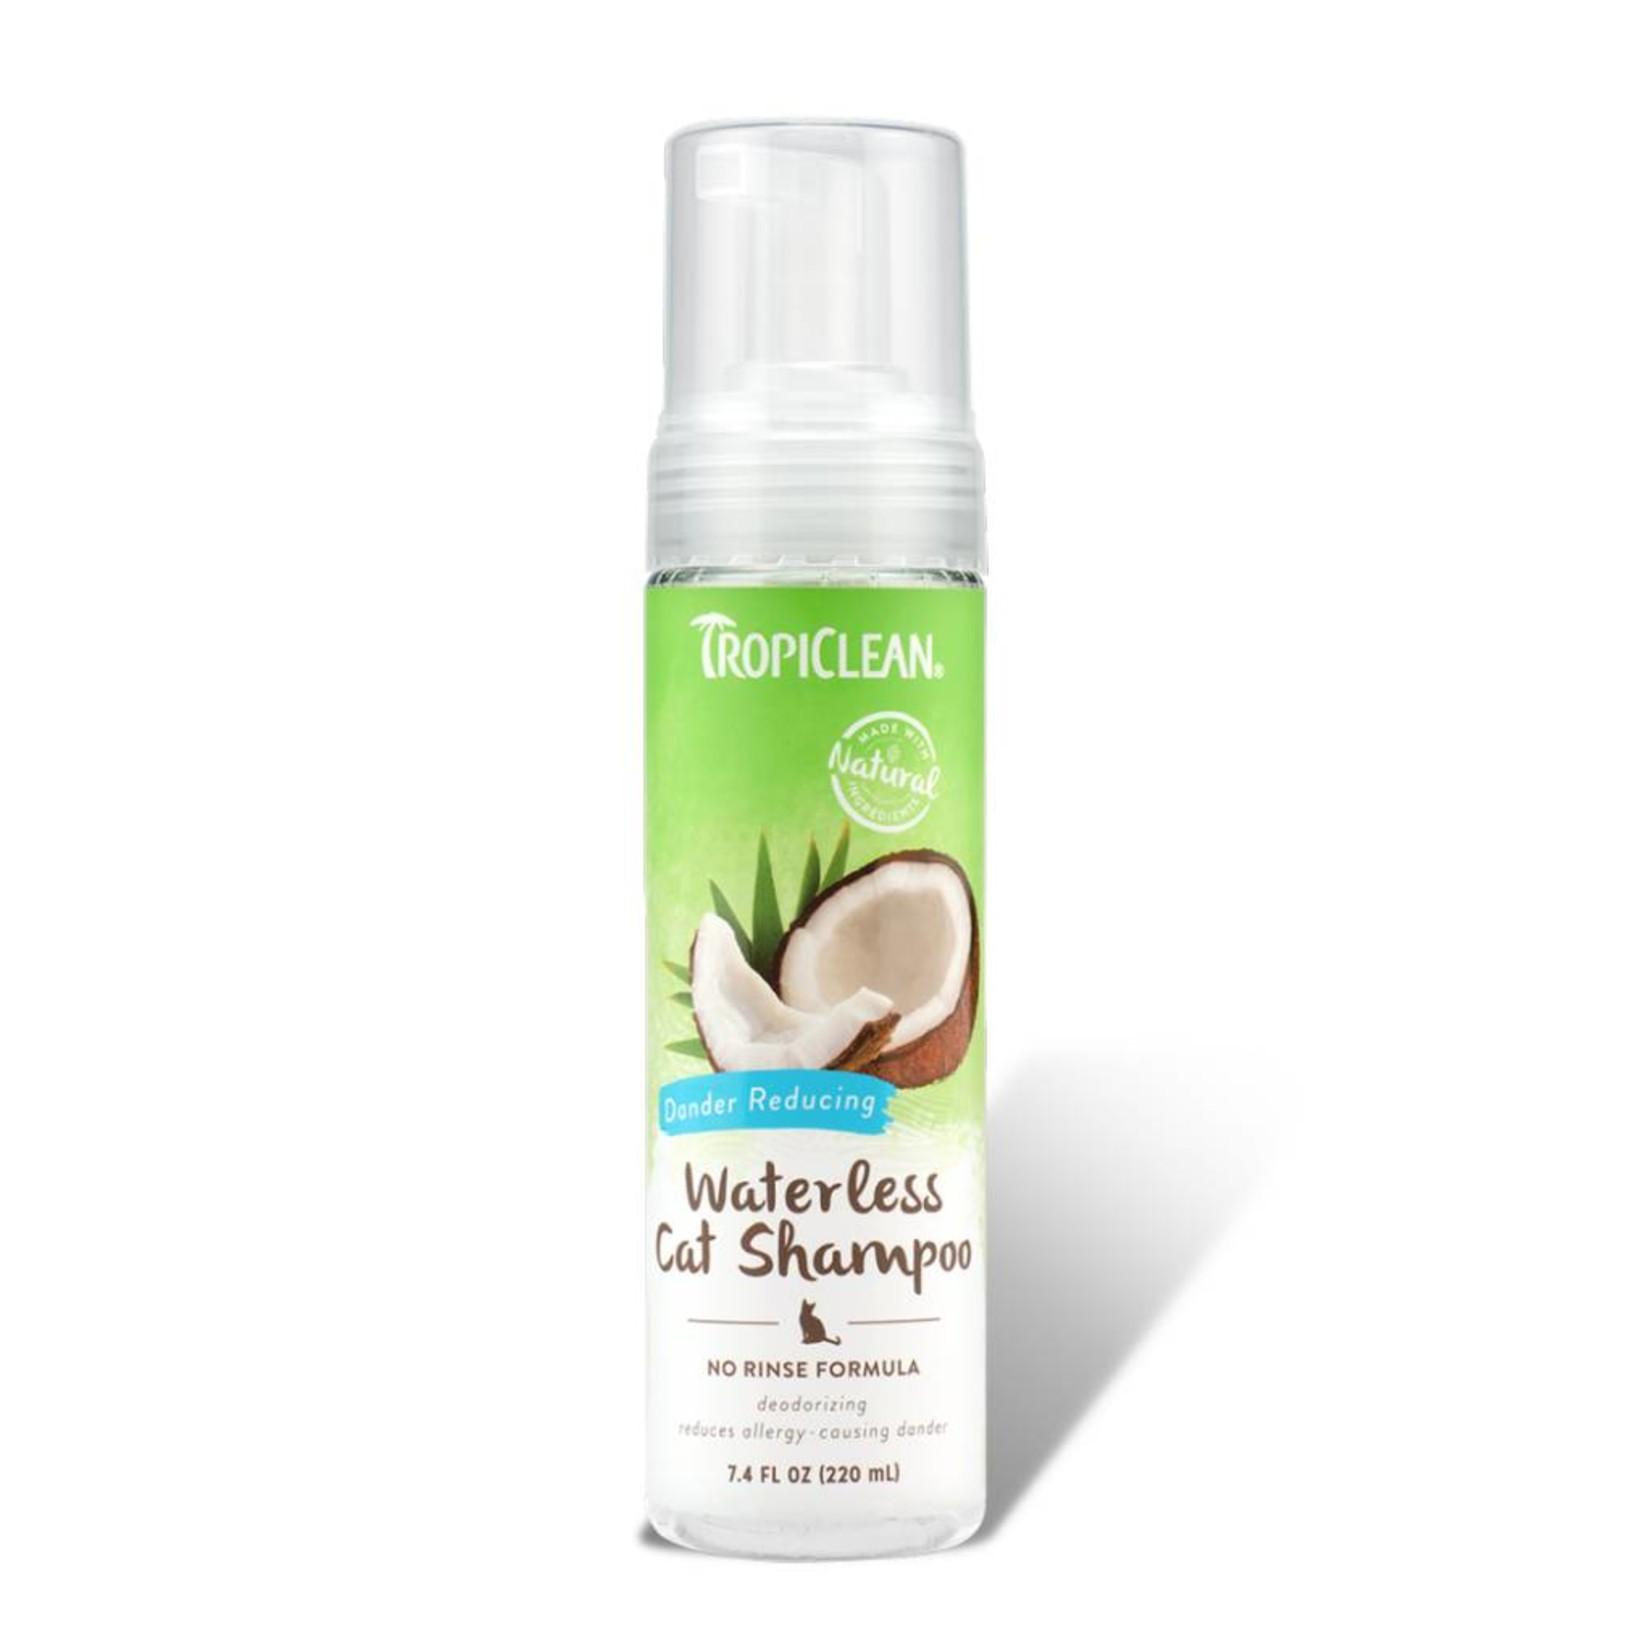 TCL Waterless CAT Shampoo Dander Reducing 7.4oz